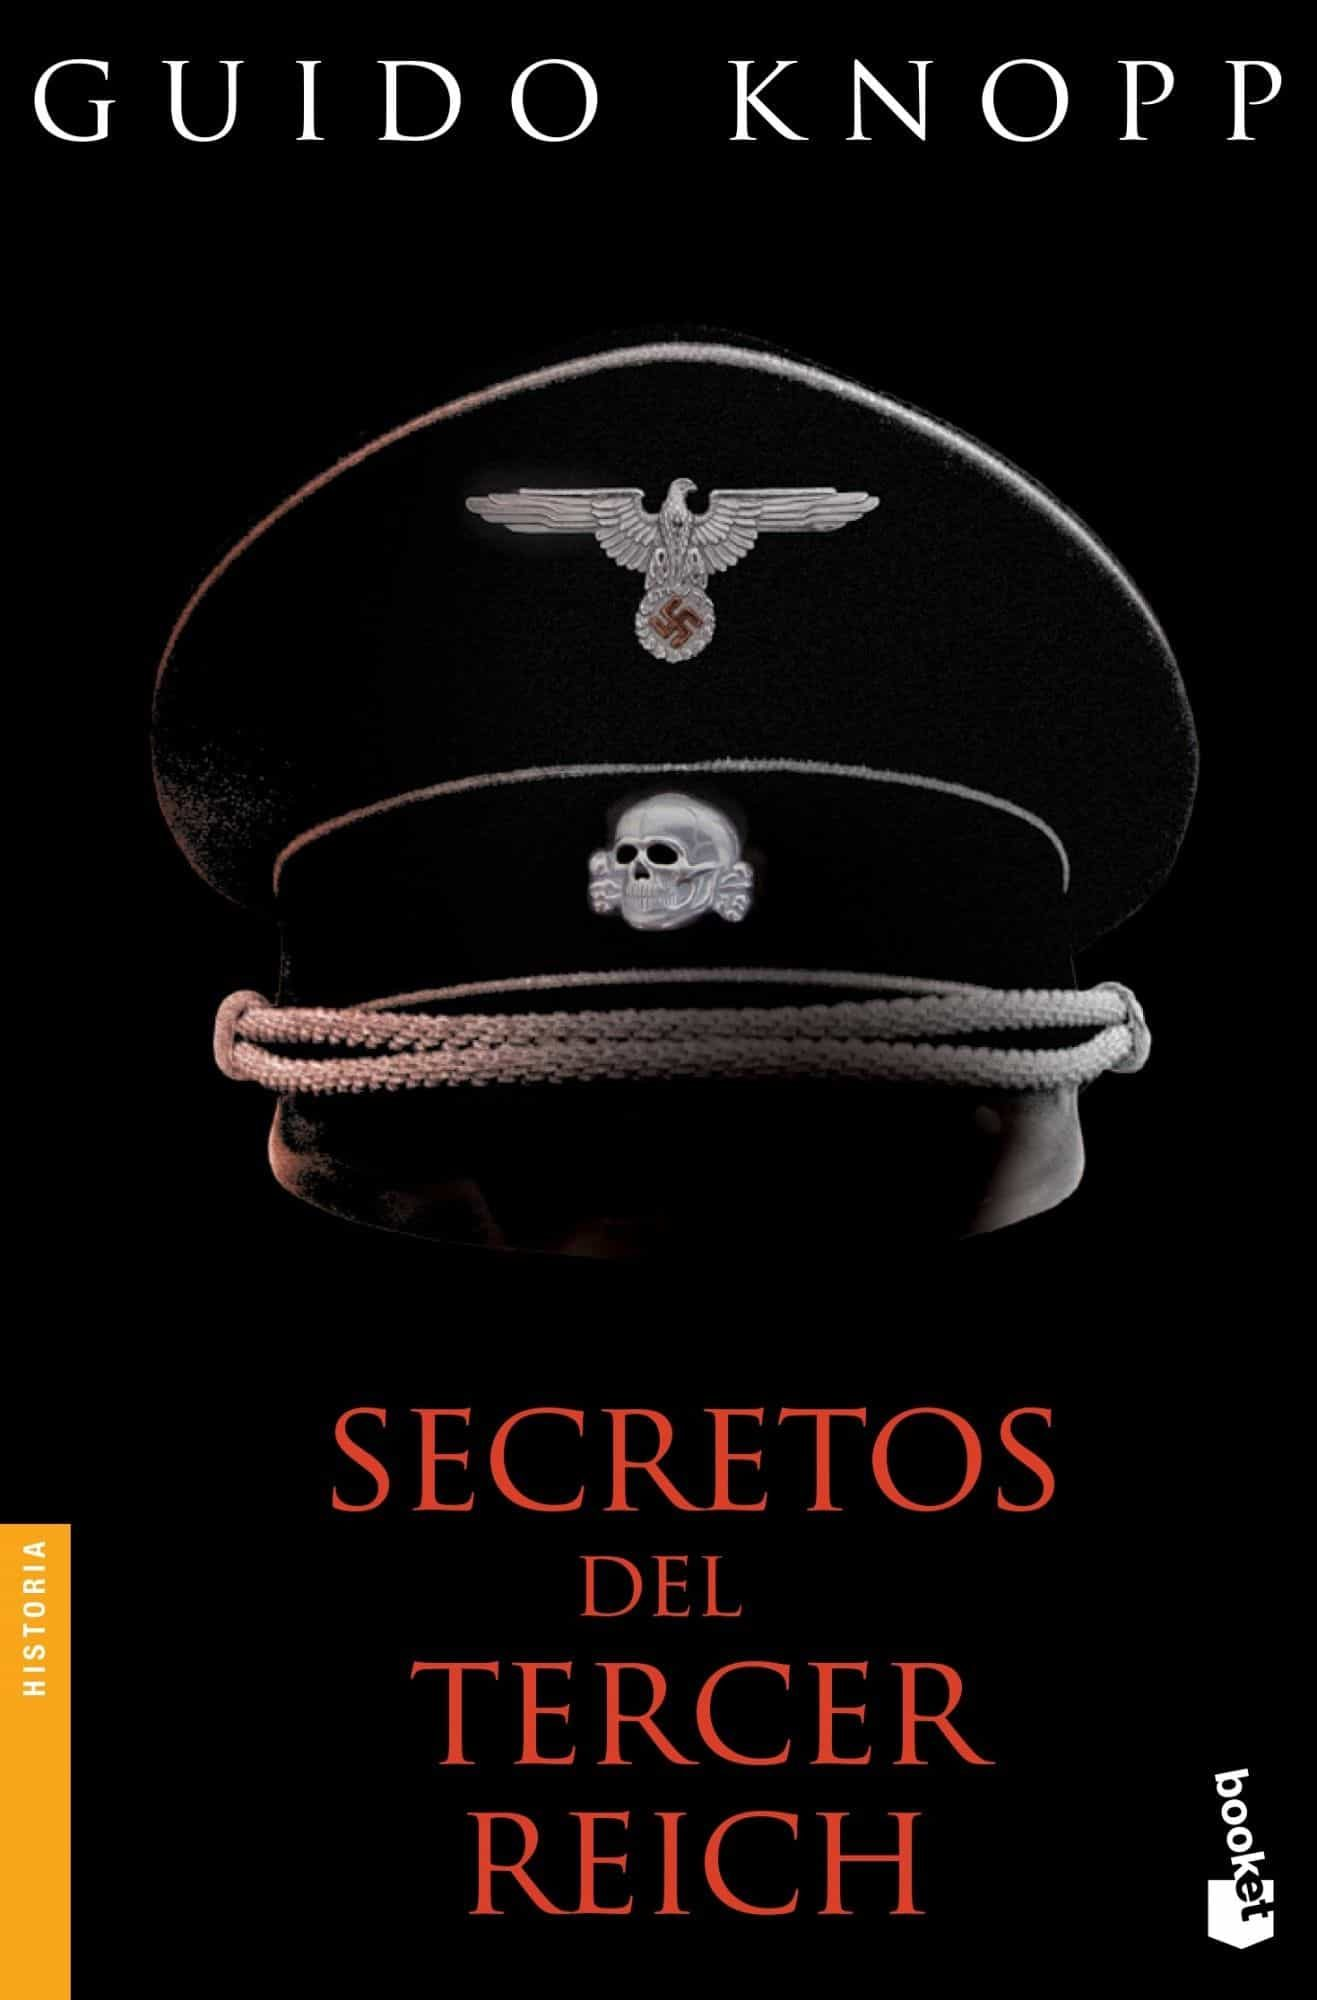 secretos del tercer reich-guido knopp-9788408123729